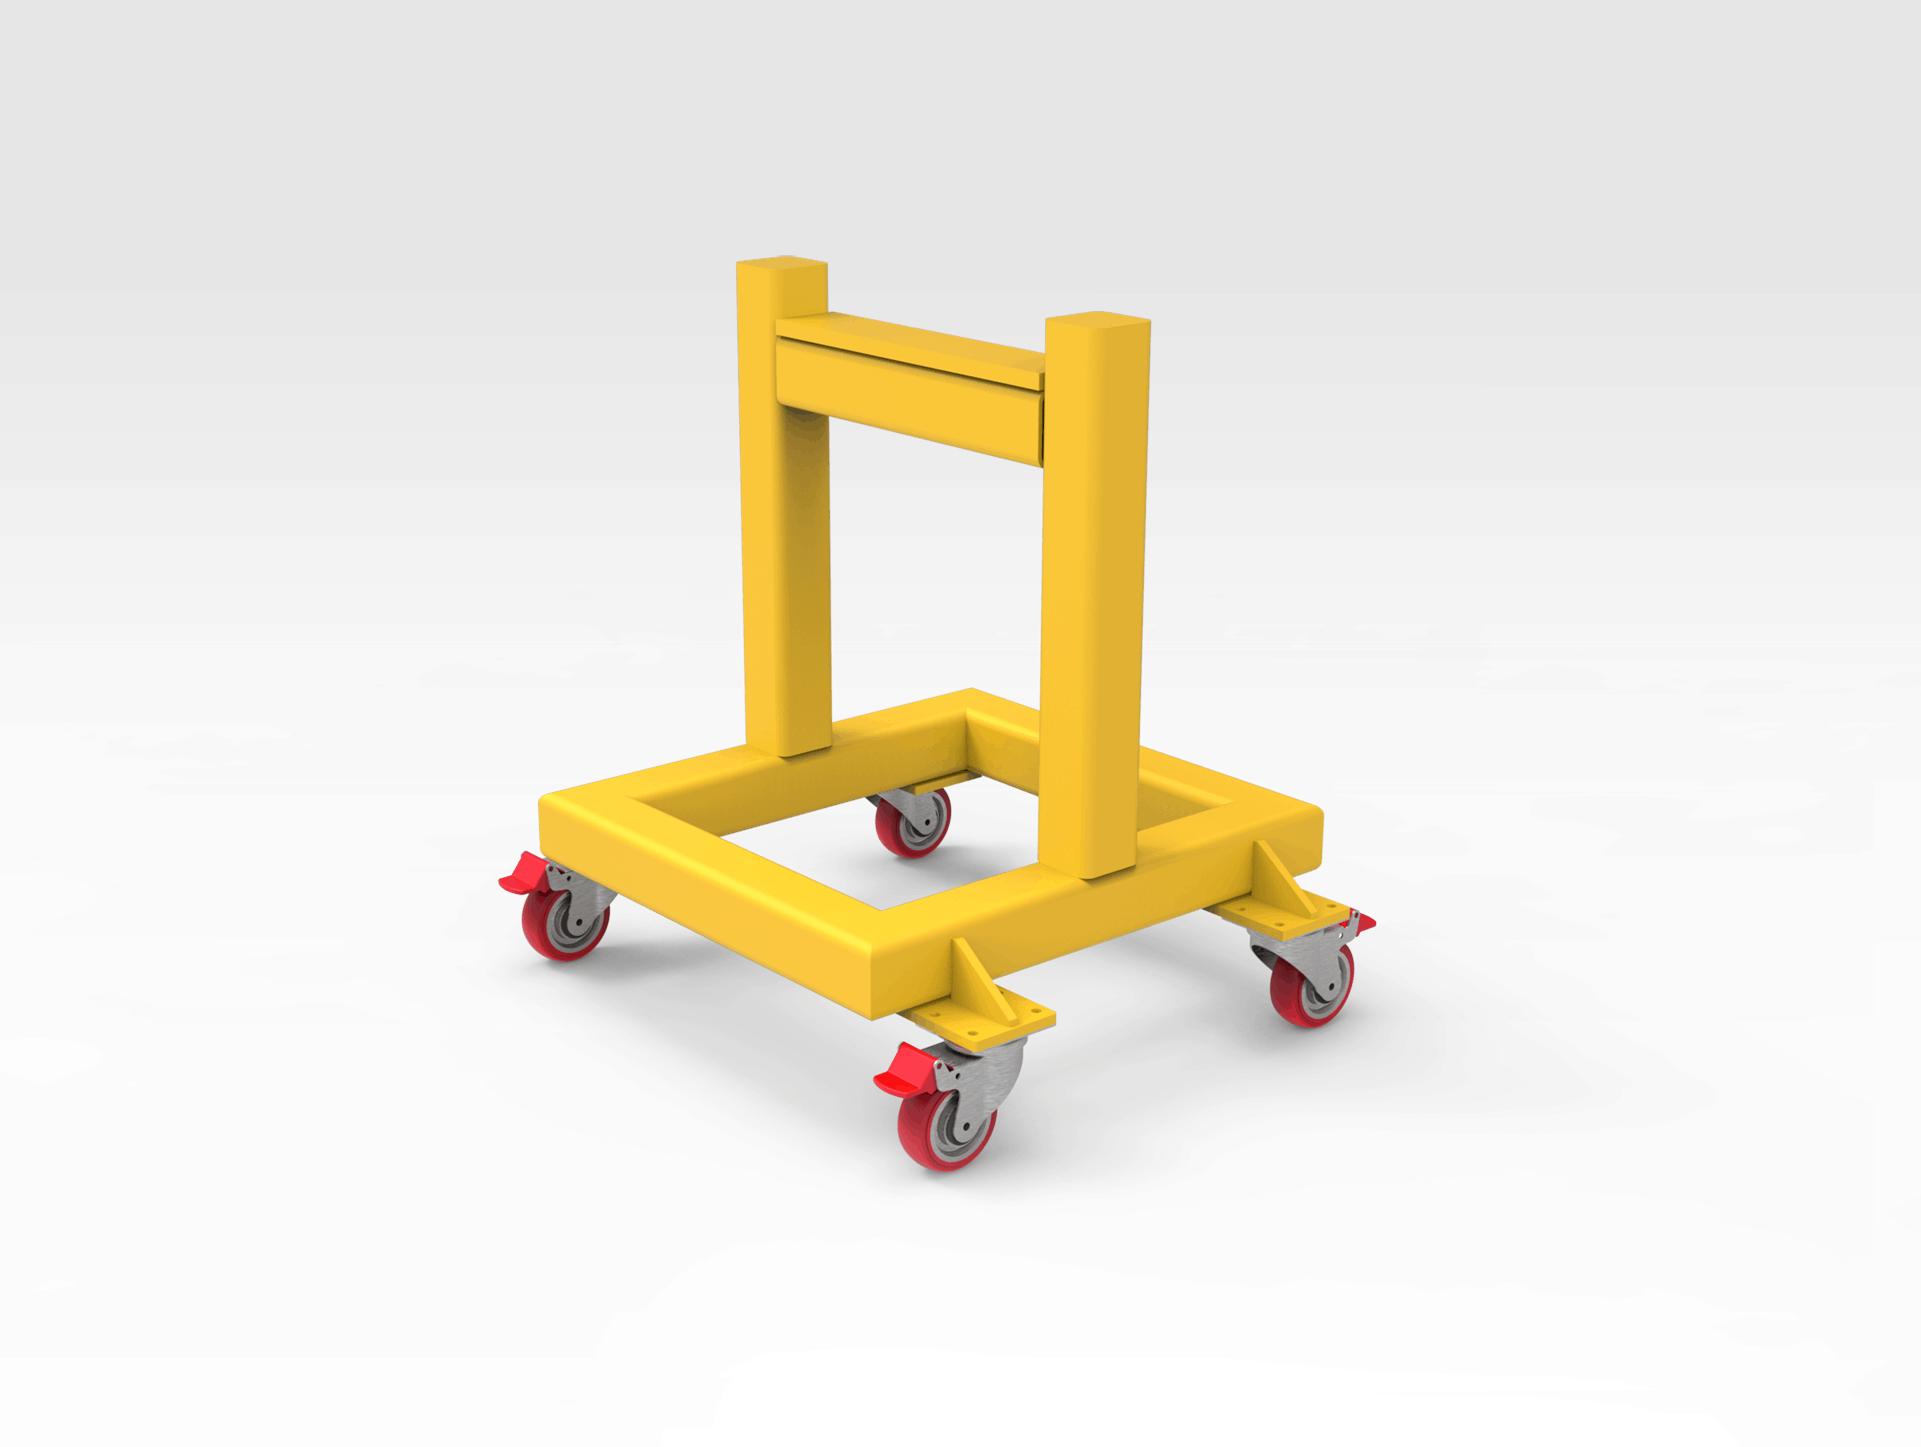 5501714 Steel Support Stand on Wheels RH